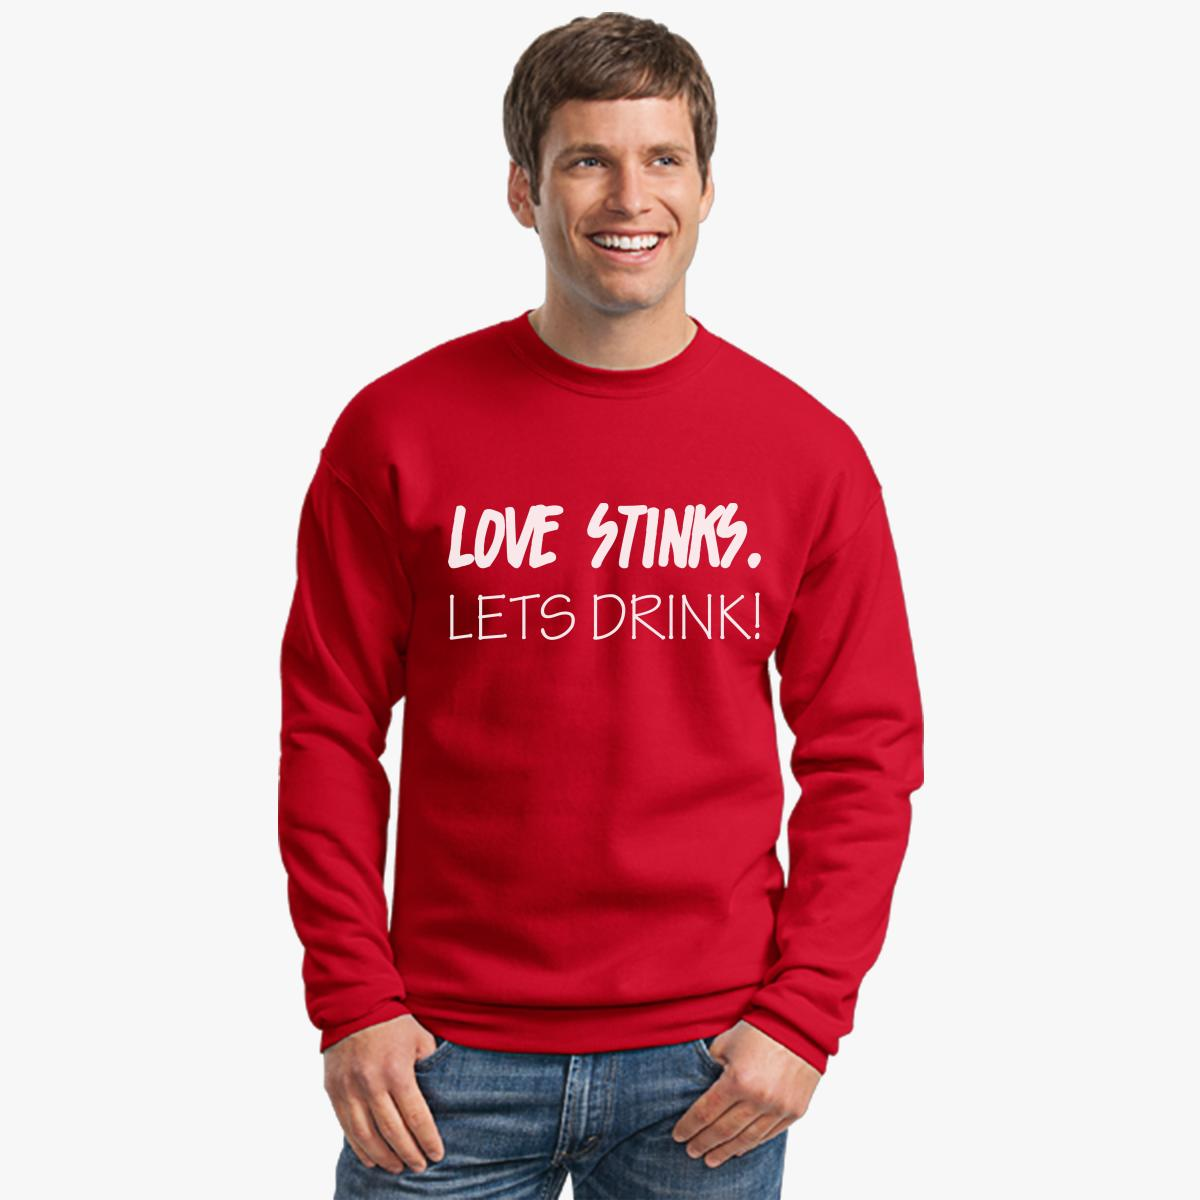 Buy Love Stinks Lets Drink Crewneck Sweatshirt, 333765